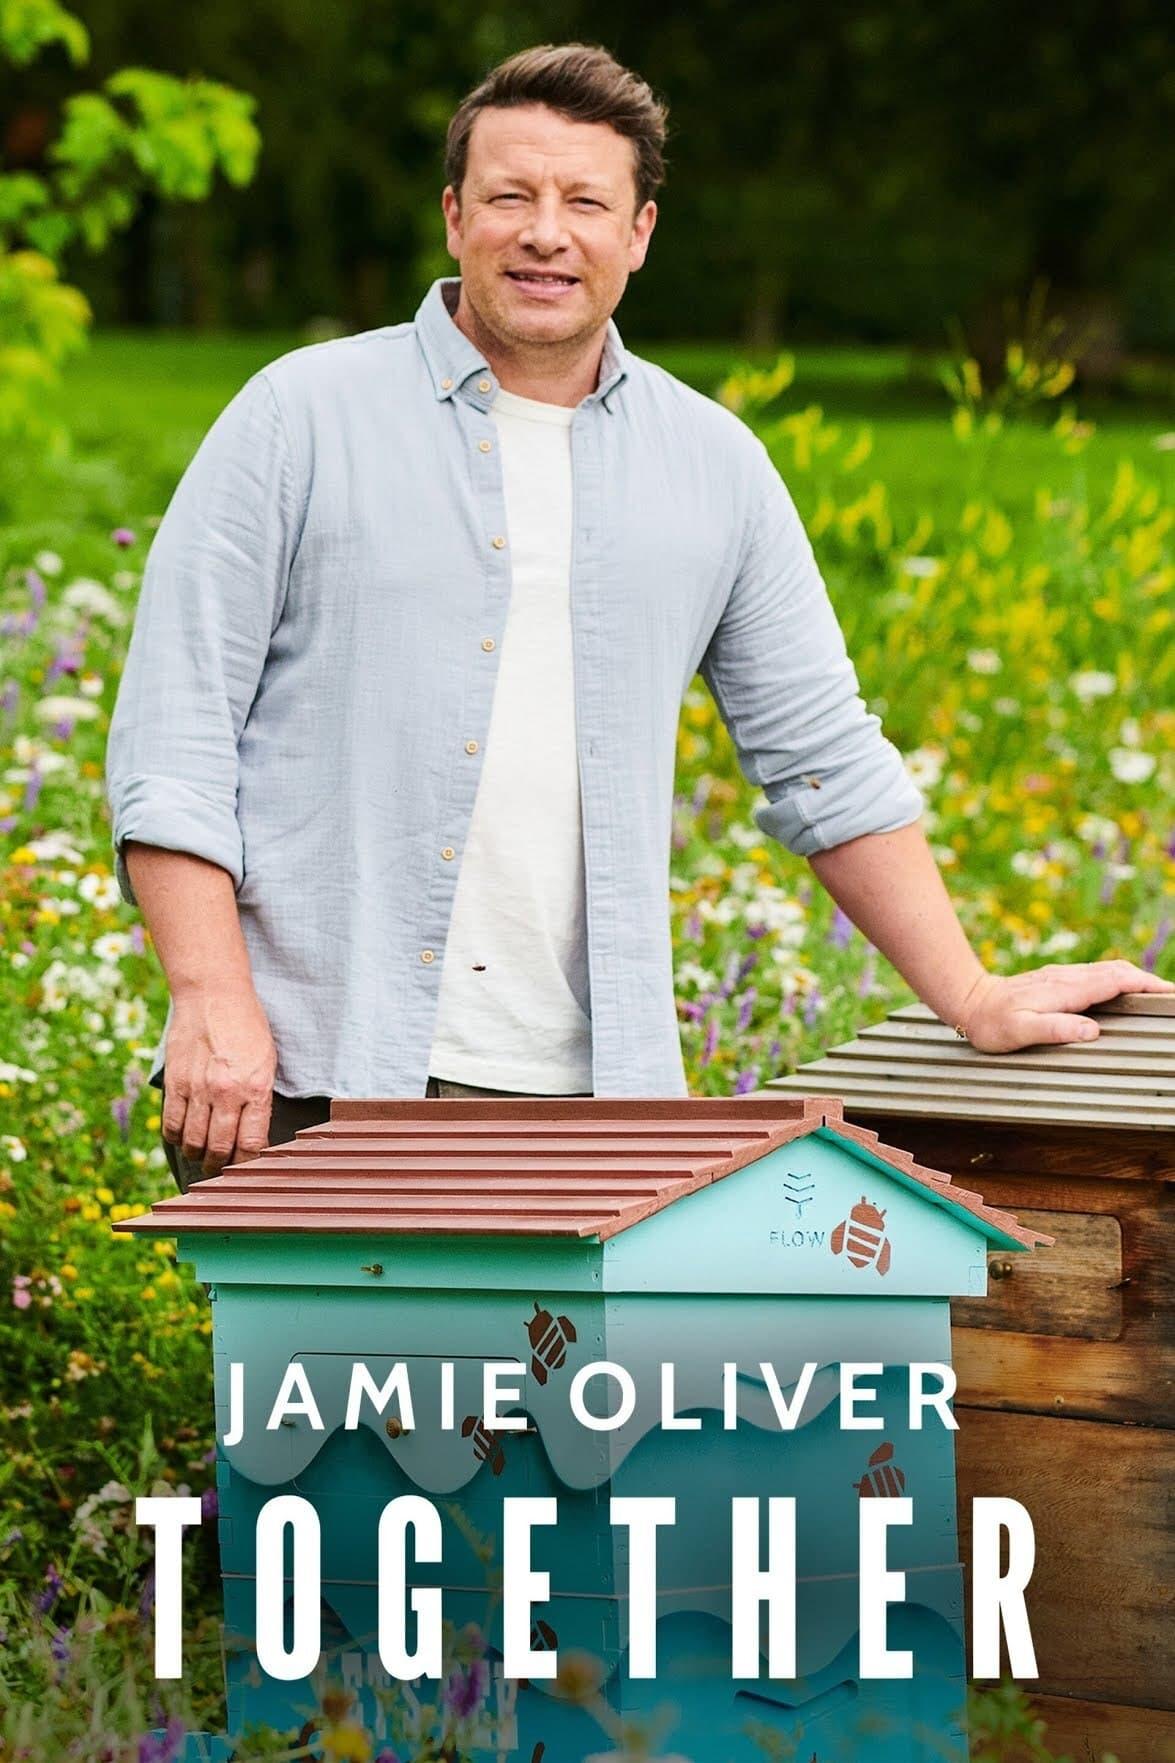 Jamie Oliver: Together TV Shows About Food